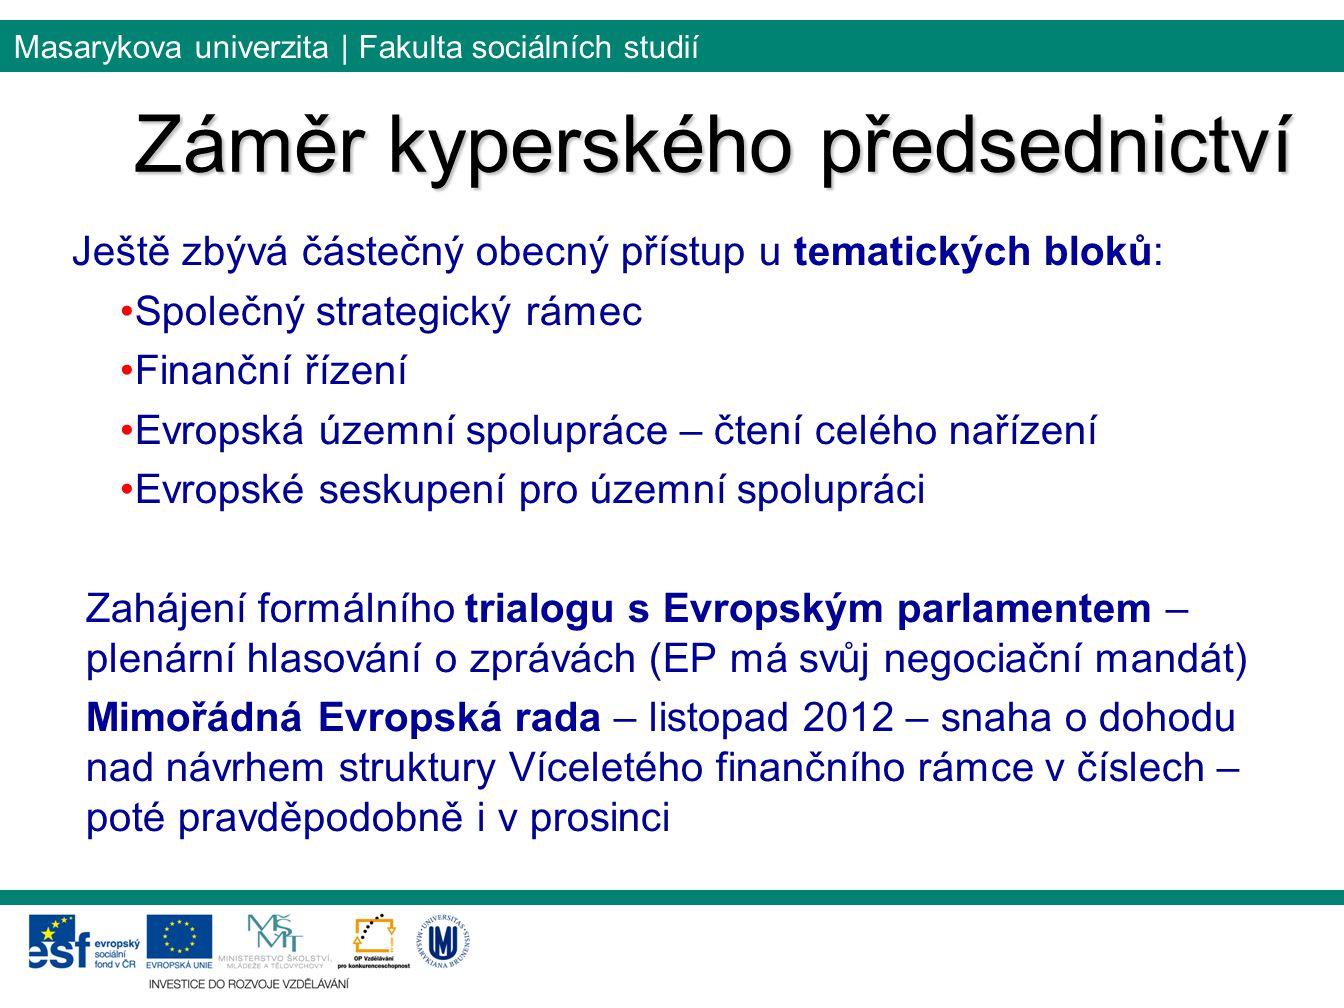 Masarykova univerzita | Fakulta sociálních studií Harmonizace EFRR-ESF-FS s EZFRV-ENRF Nastavení synergií a rozhraní mezi EFRR/ESF/FS a EZFRV/ENRF.